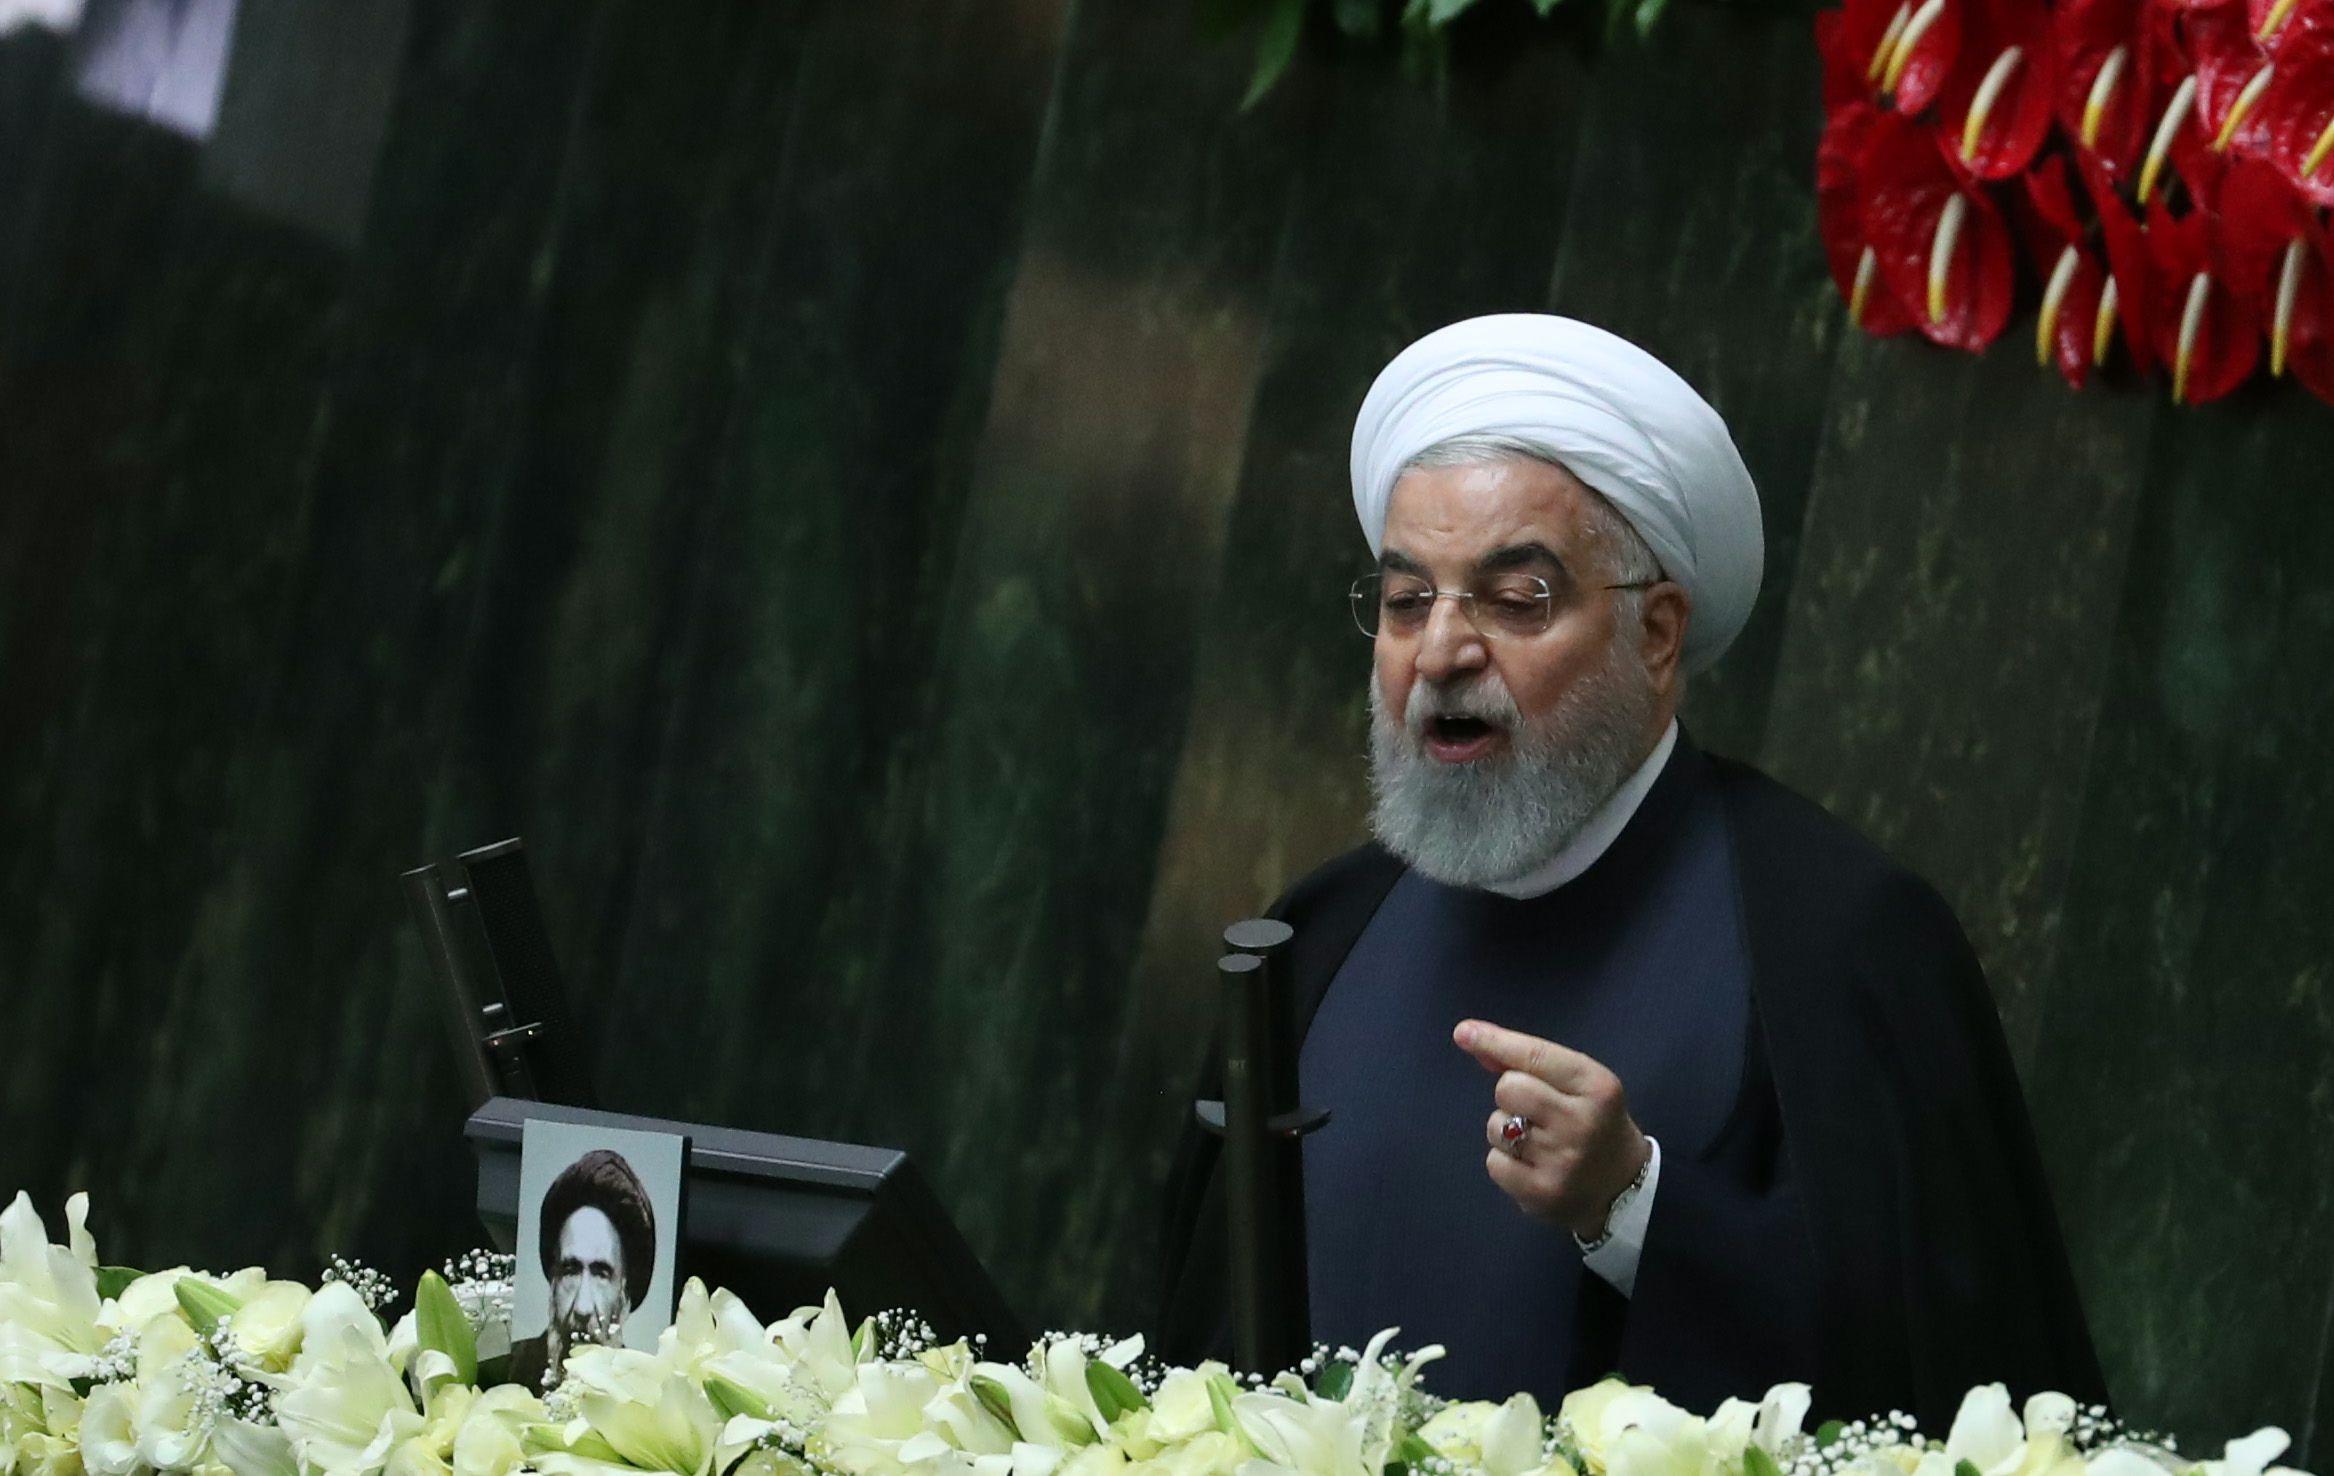 El presidente iraní, Hasan Rohaní. EFE/EPA/ABEDIN TAHERKENAREH/Archivo